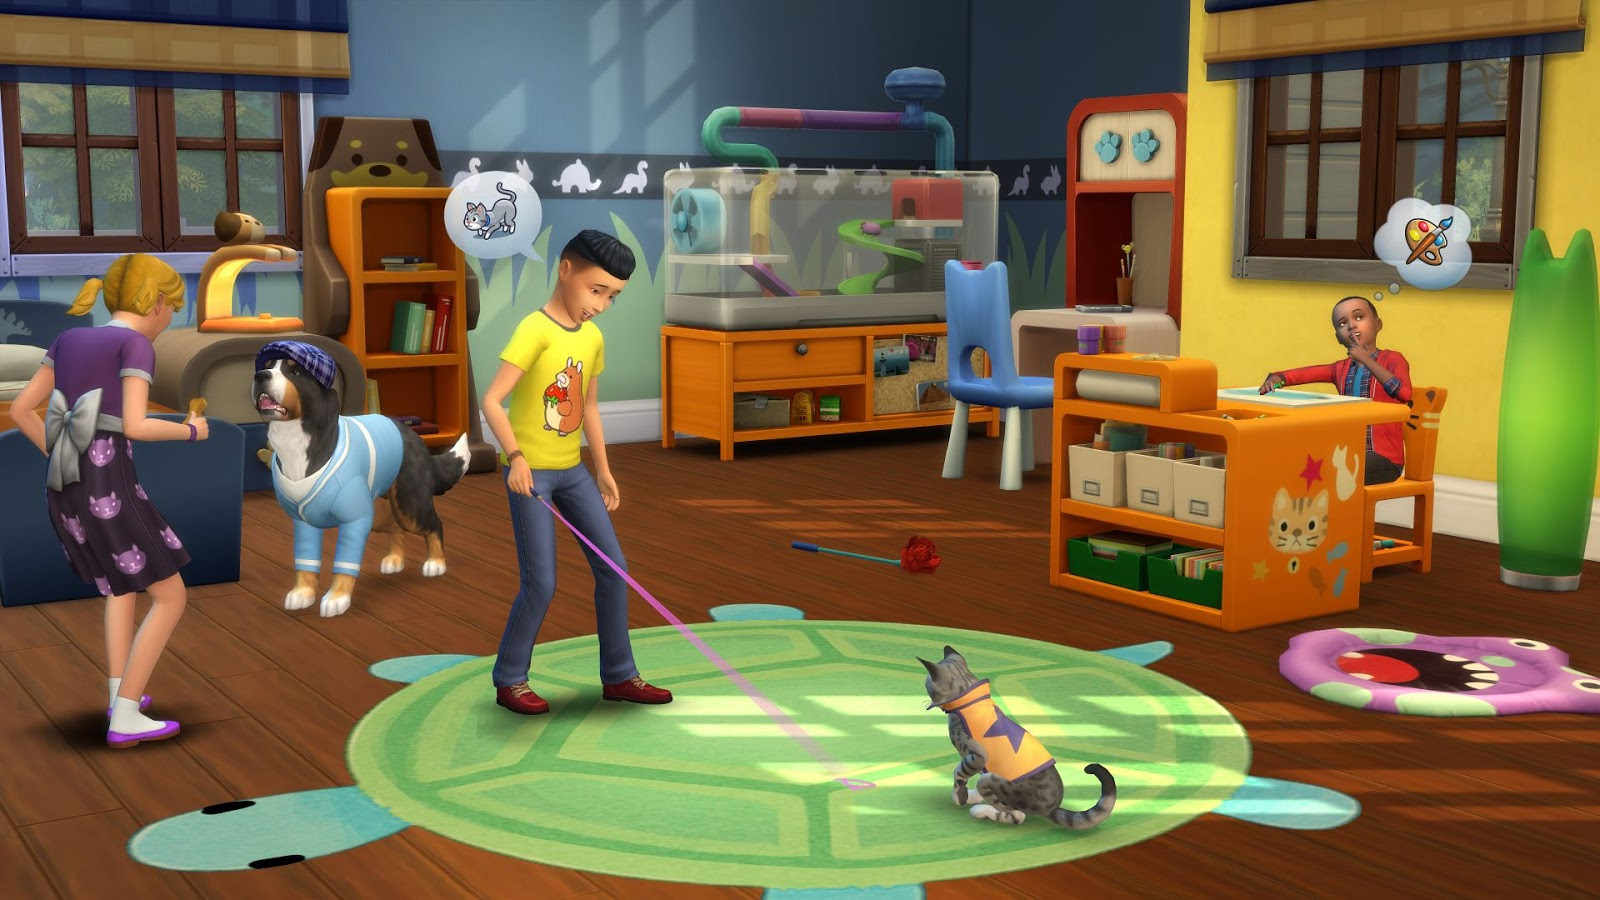 Los Sims 4 Mi Primera Mascota (CODEX) + REPACK PROPER 5 DVD5 + 1 ISO (JPW) 3